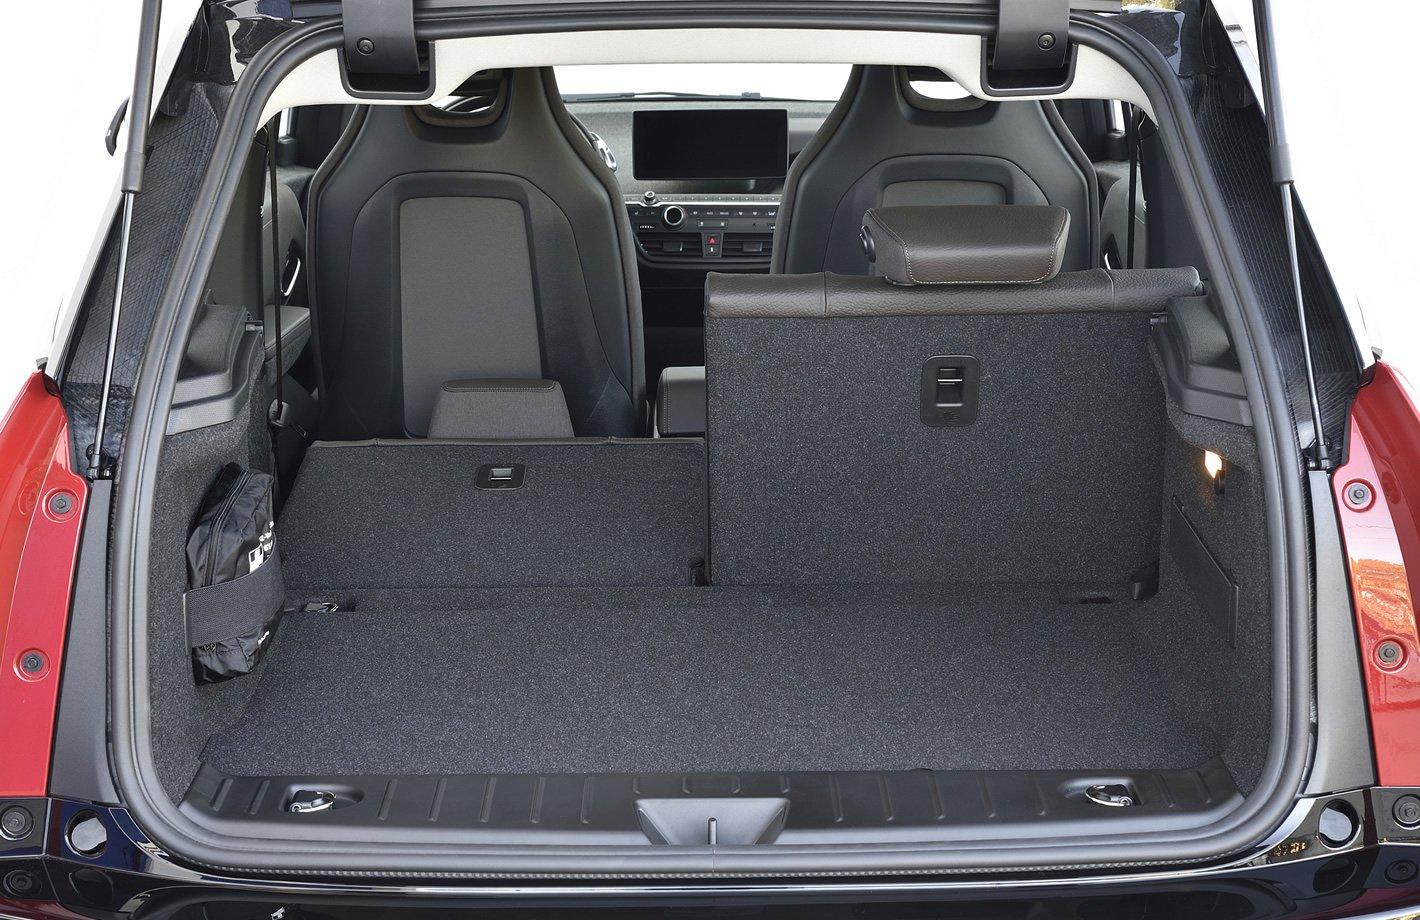 BMW i3 94 Ah - bagażnik